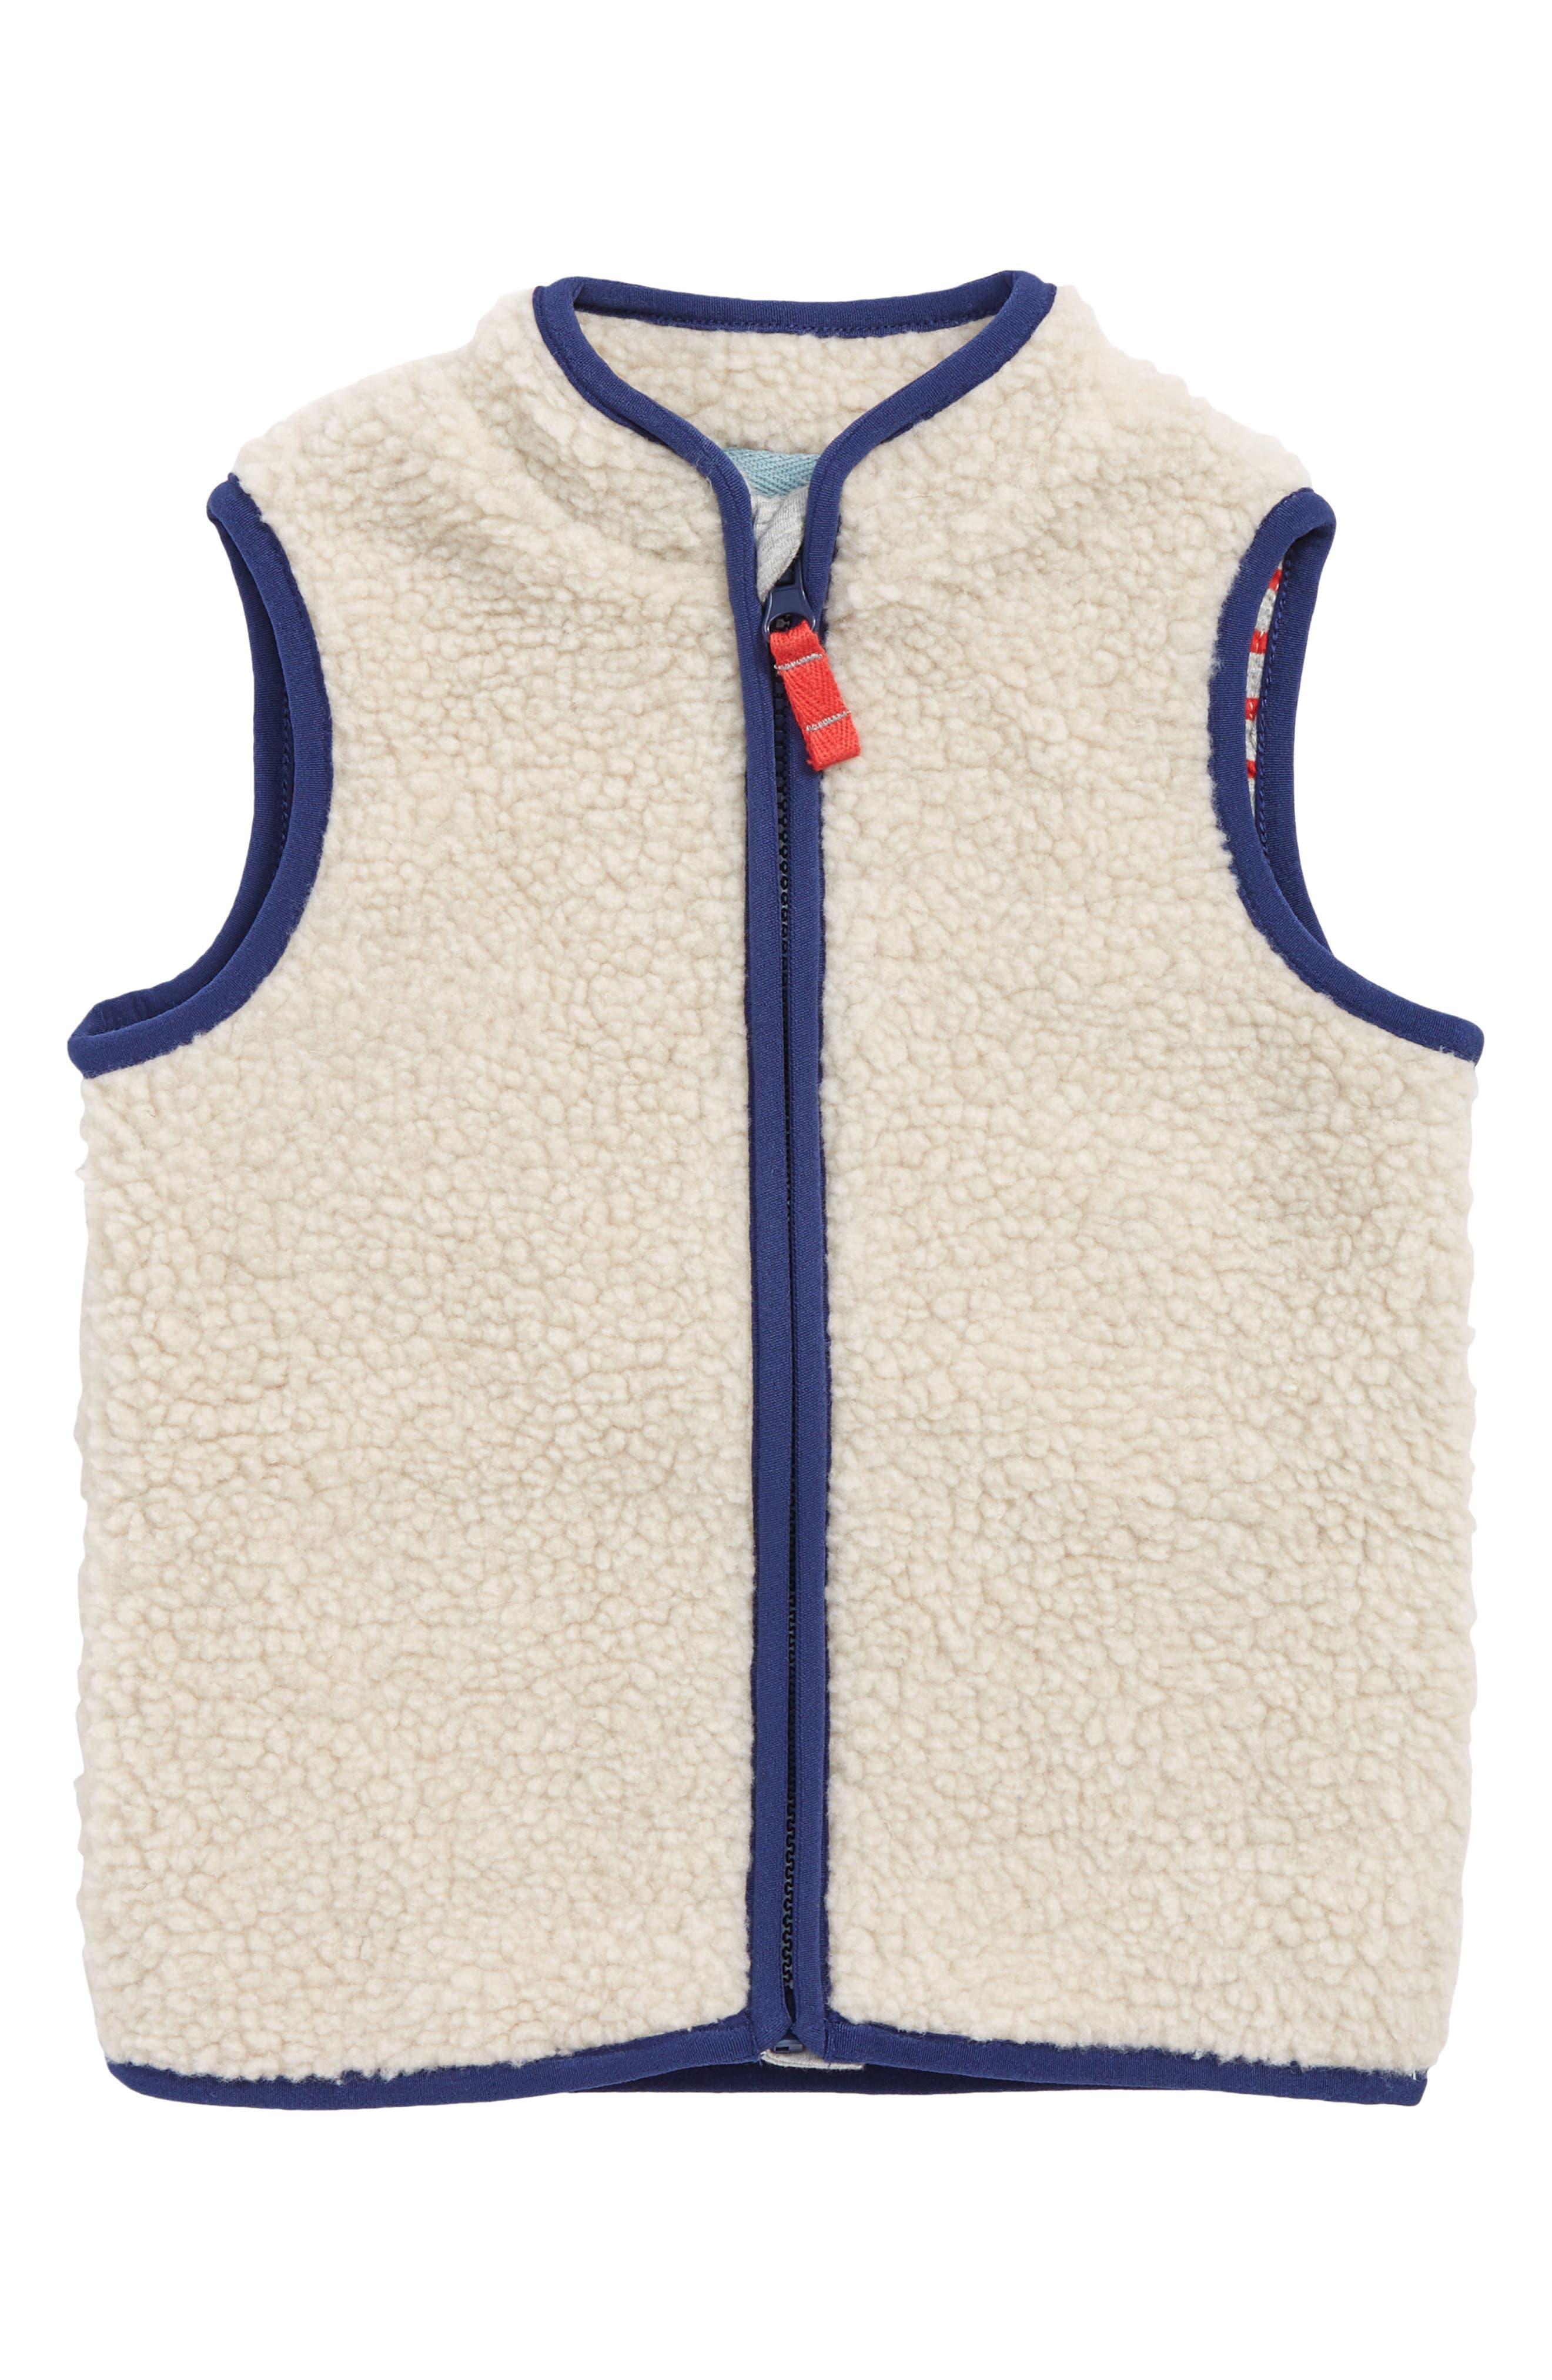 Cosy Borg Fleece Vest,                             Main thumbnail 1, color,                             251